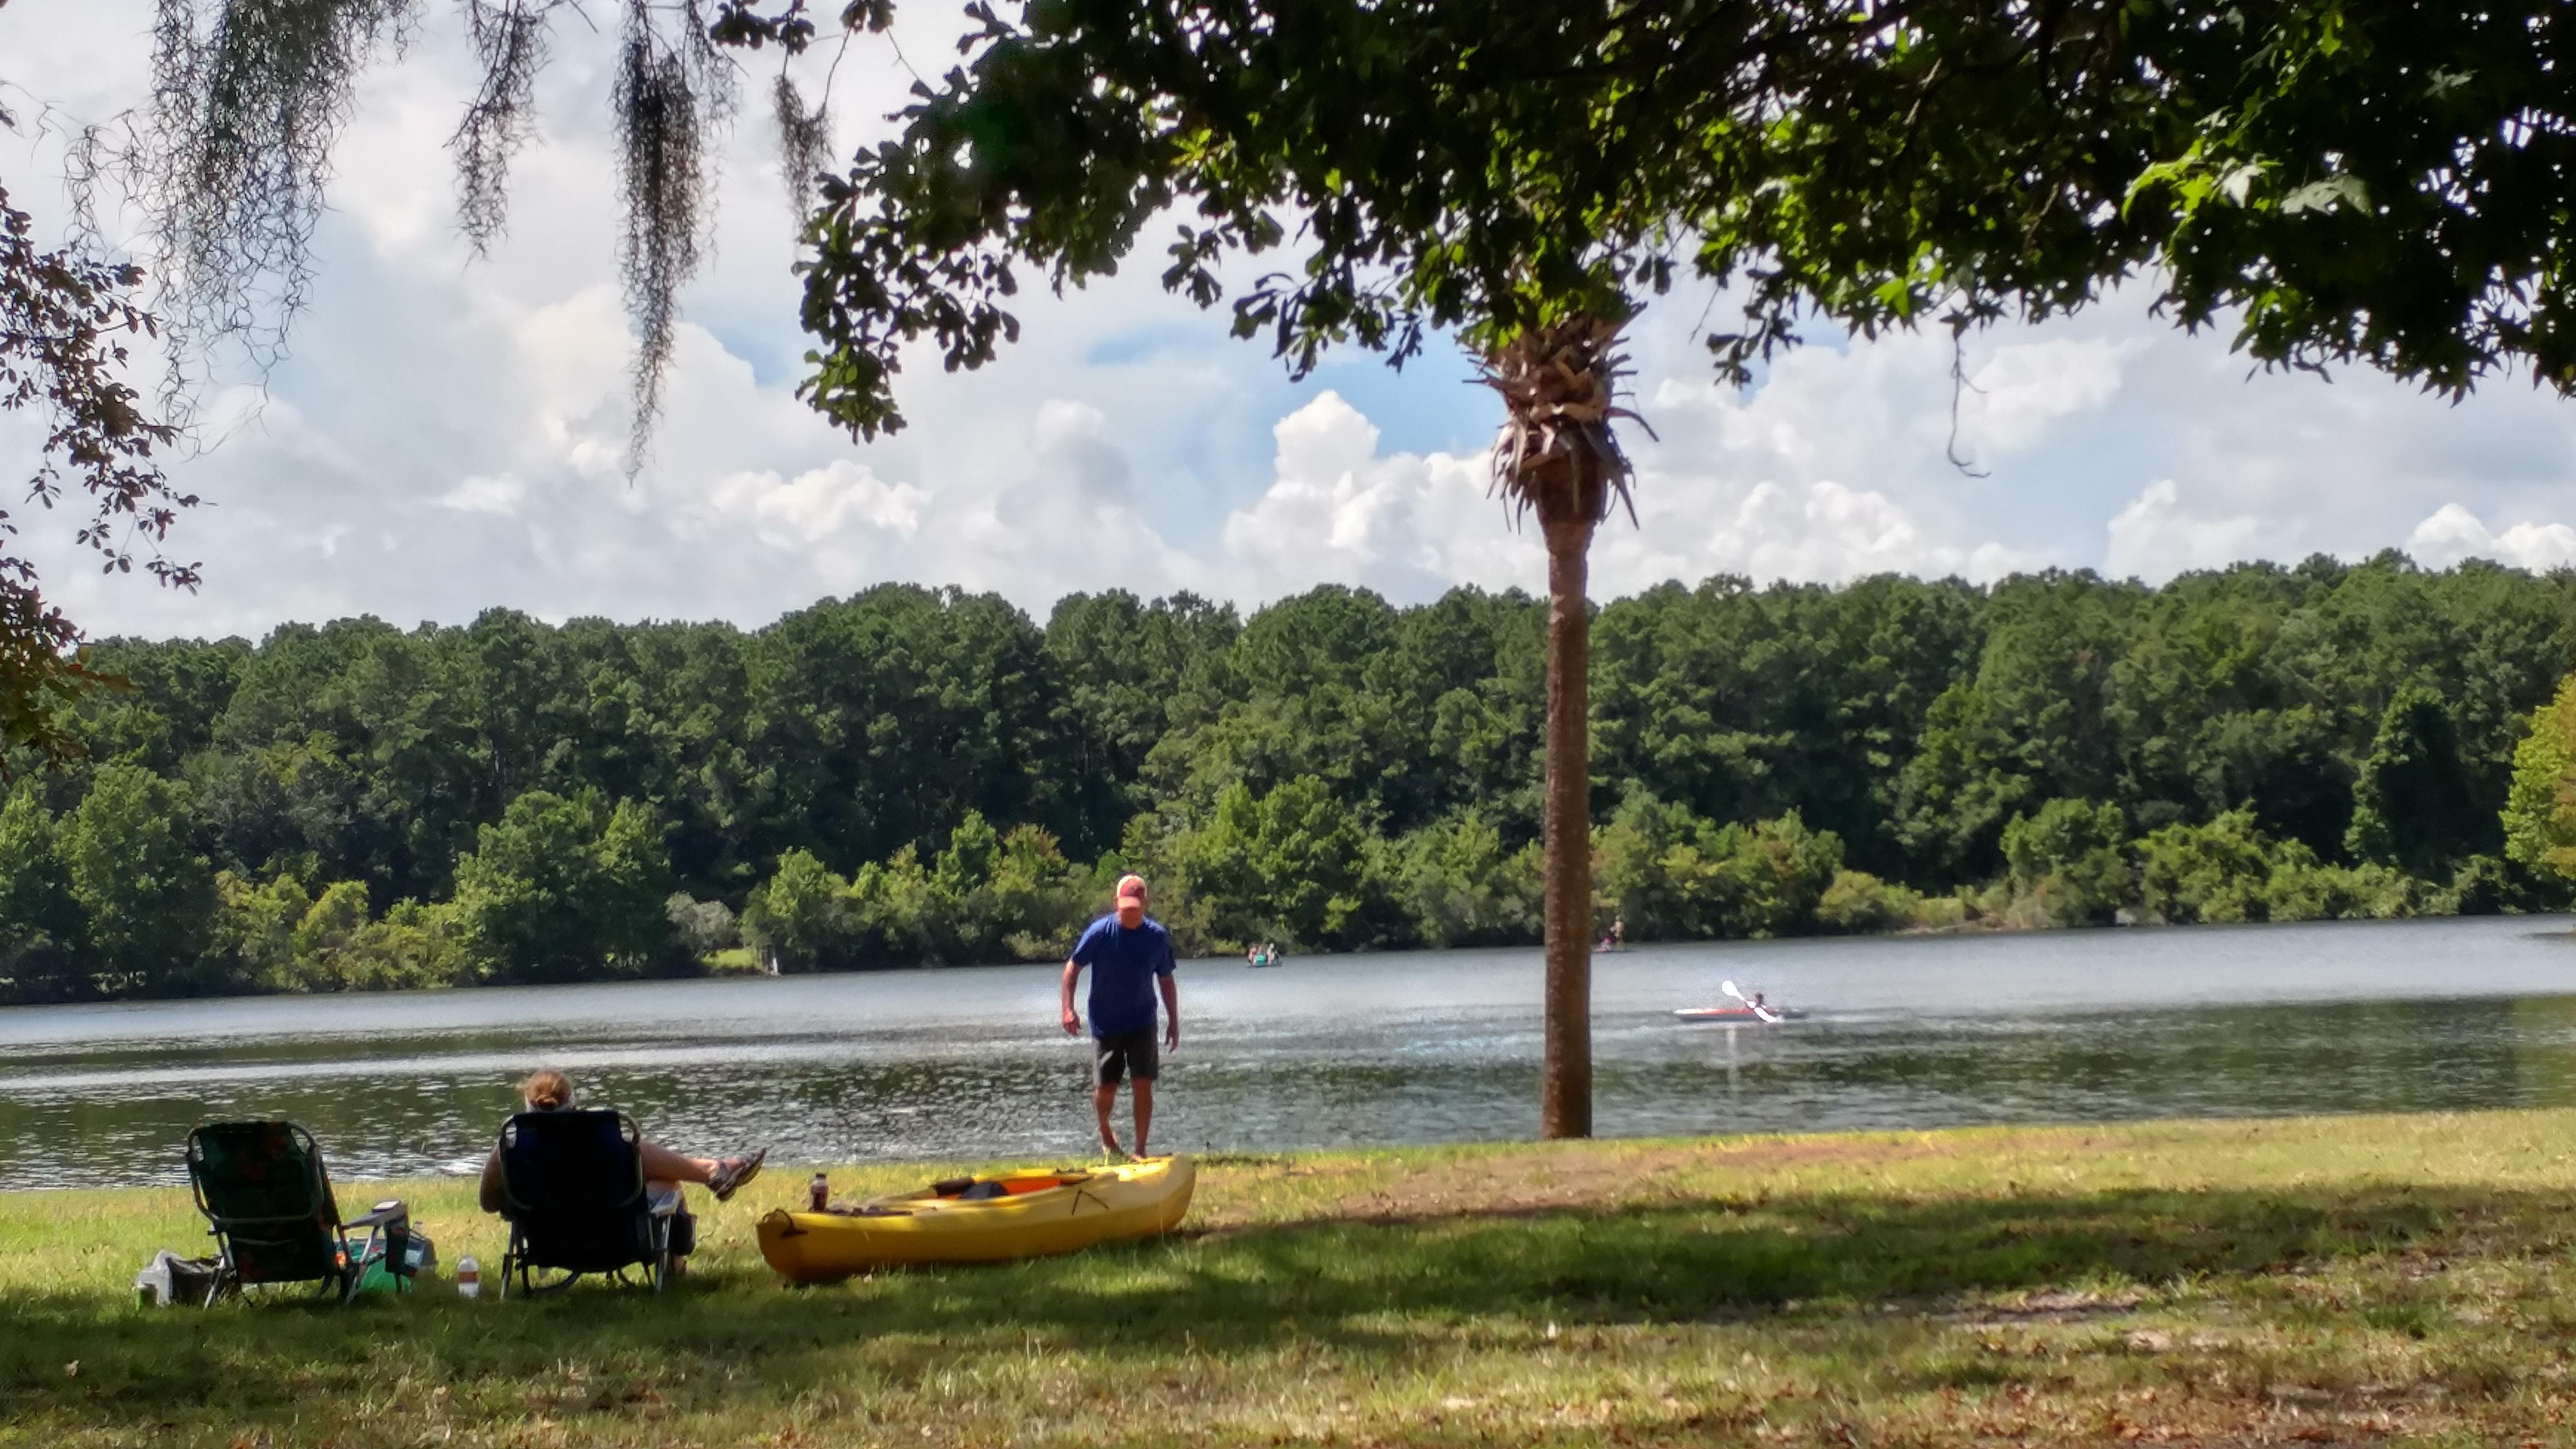 Mount Pleasant / Charleston KOA Holiday image 42